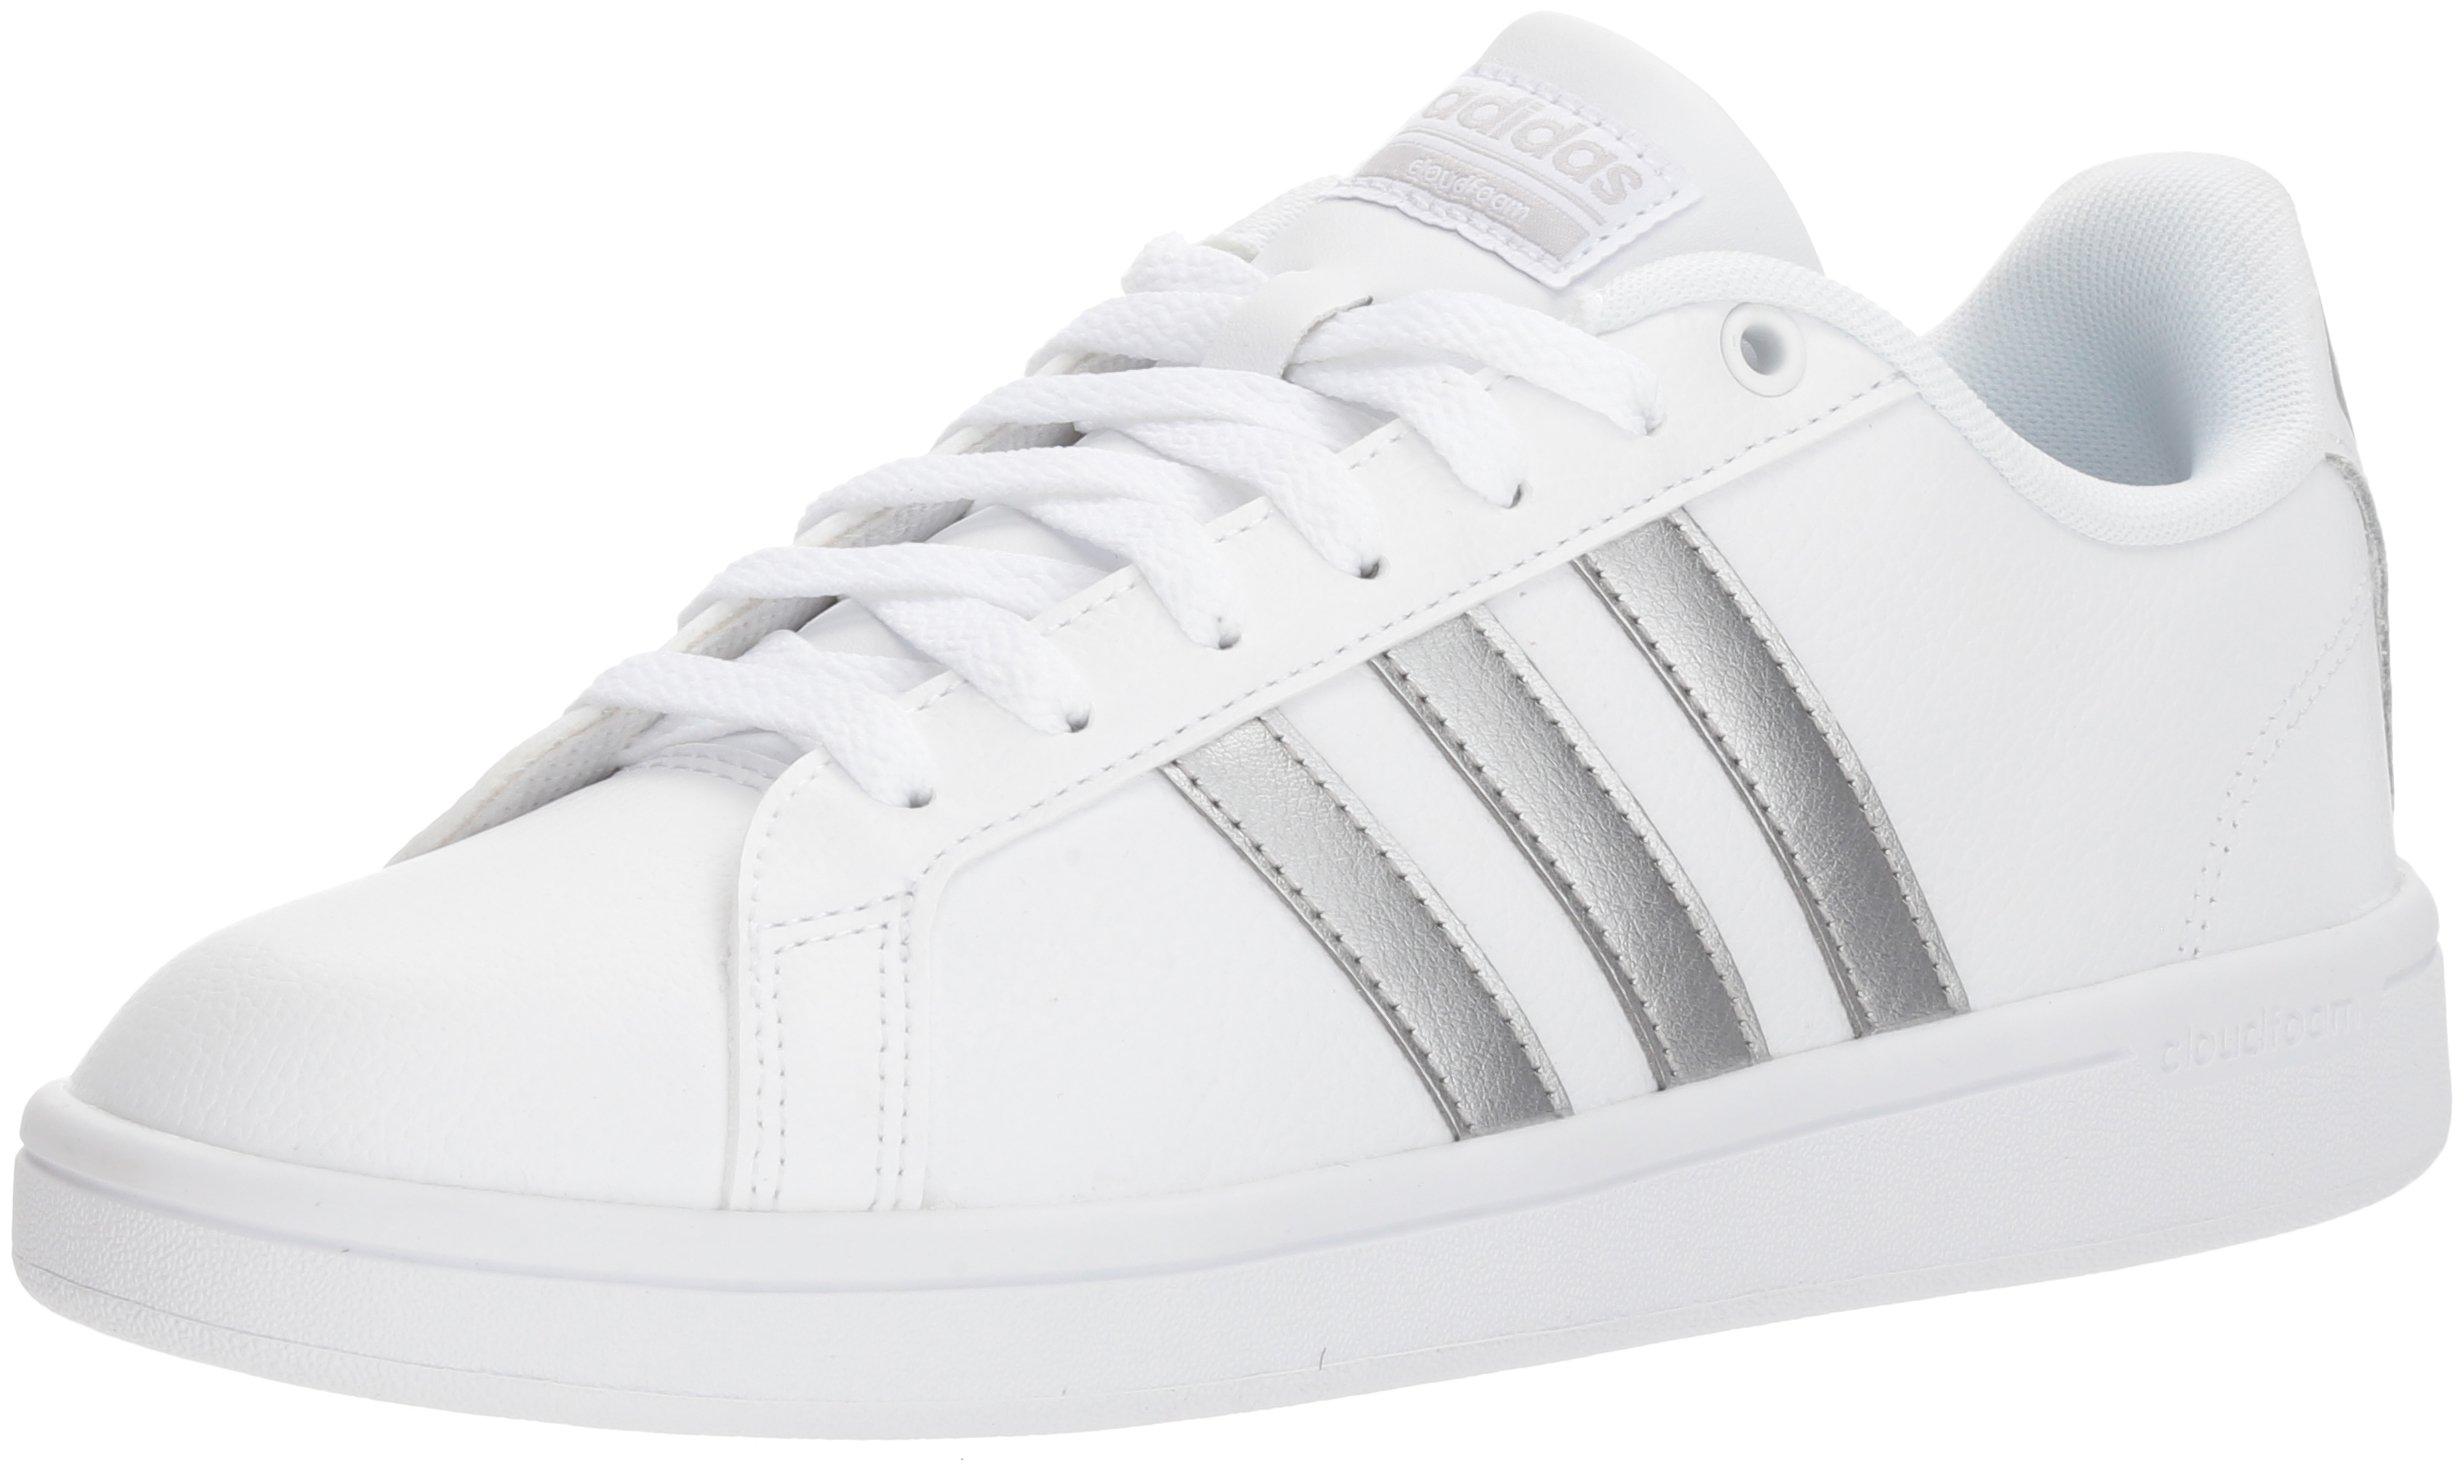 a38c4f10f30 Galleon - Adidas Women s Cf Advantage Sneaker